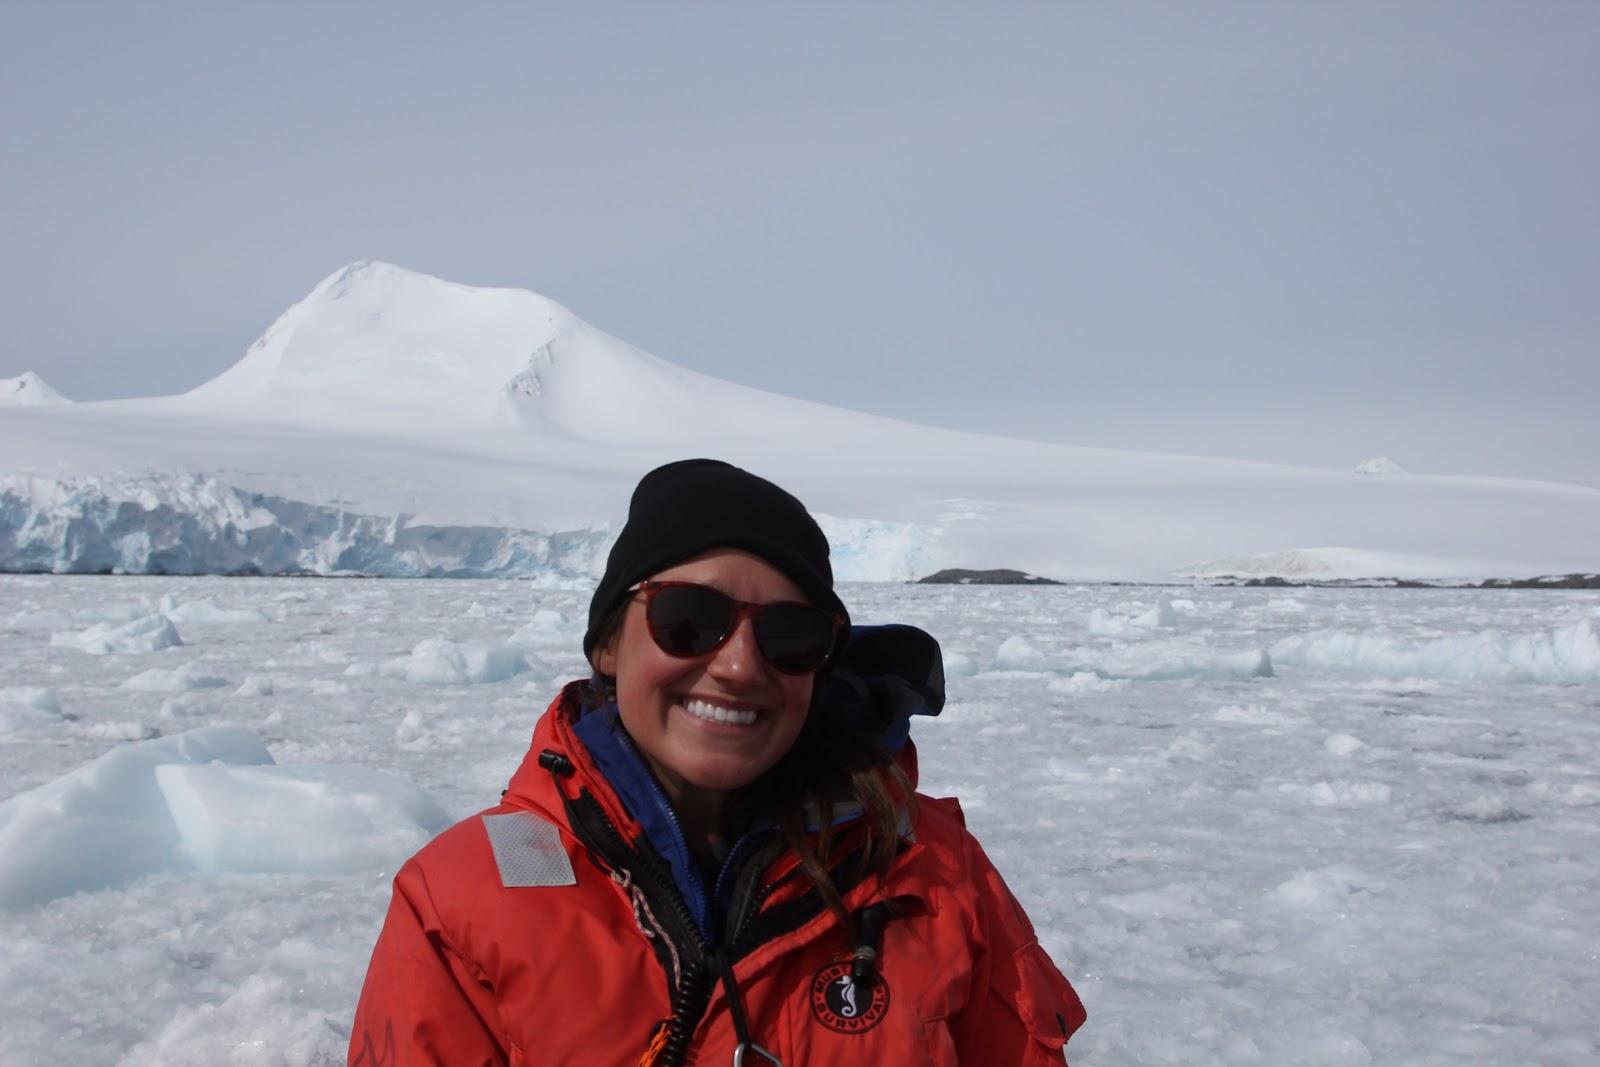 Zoologist in Antarctica - Go with Flo to Antarctica Interview | It's Megan | #antarctica #travel #zoology